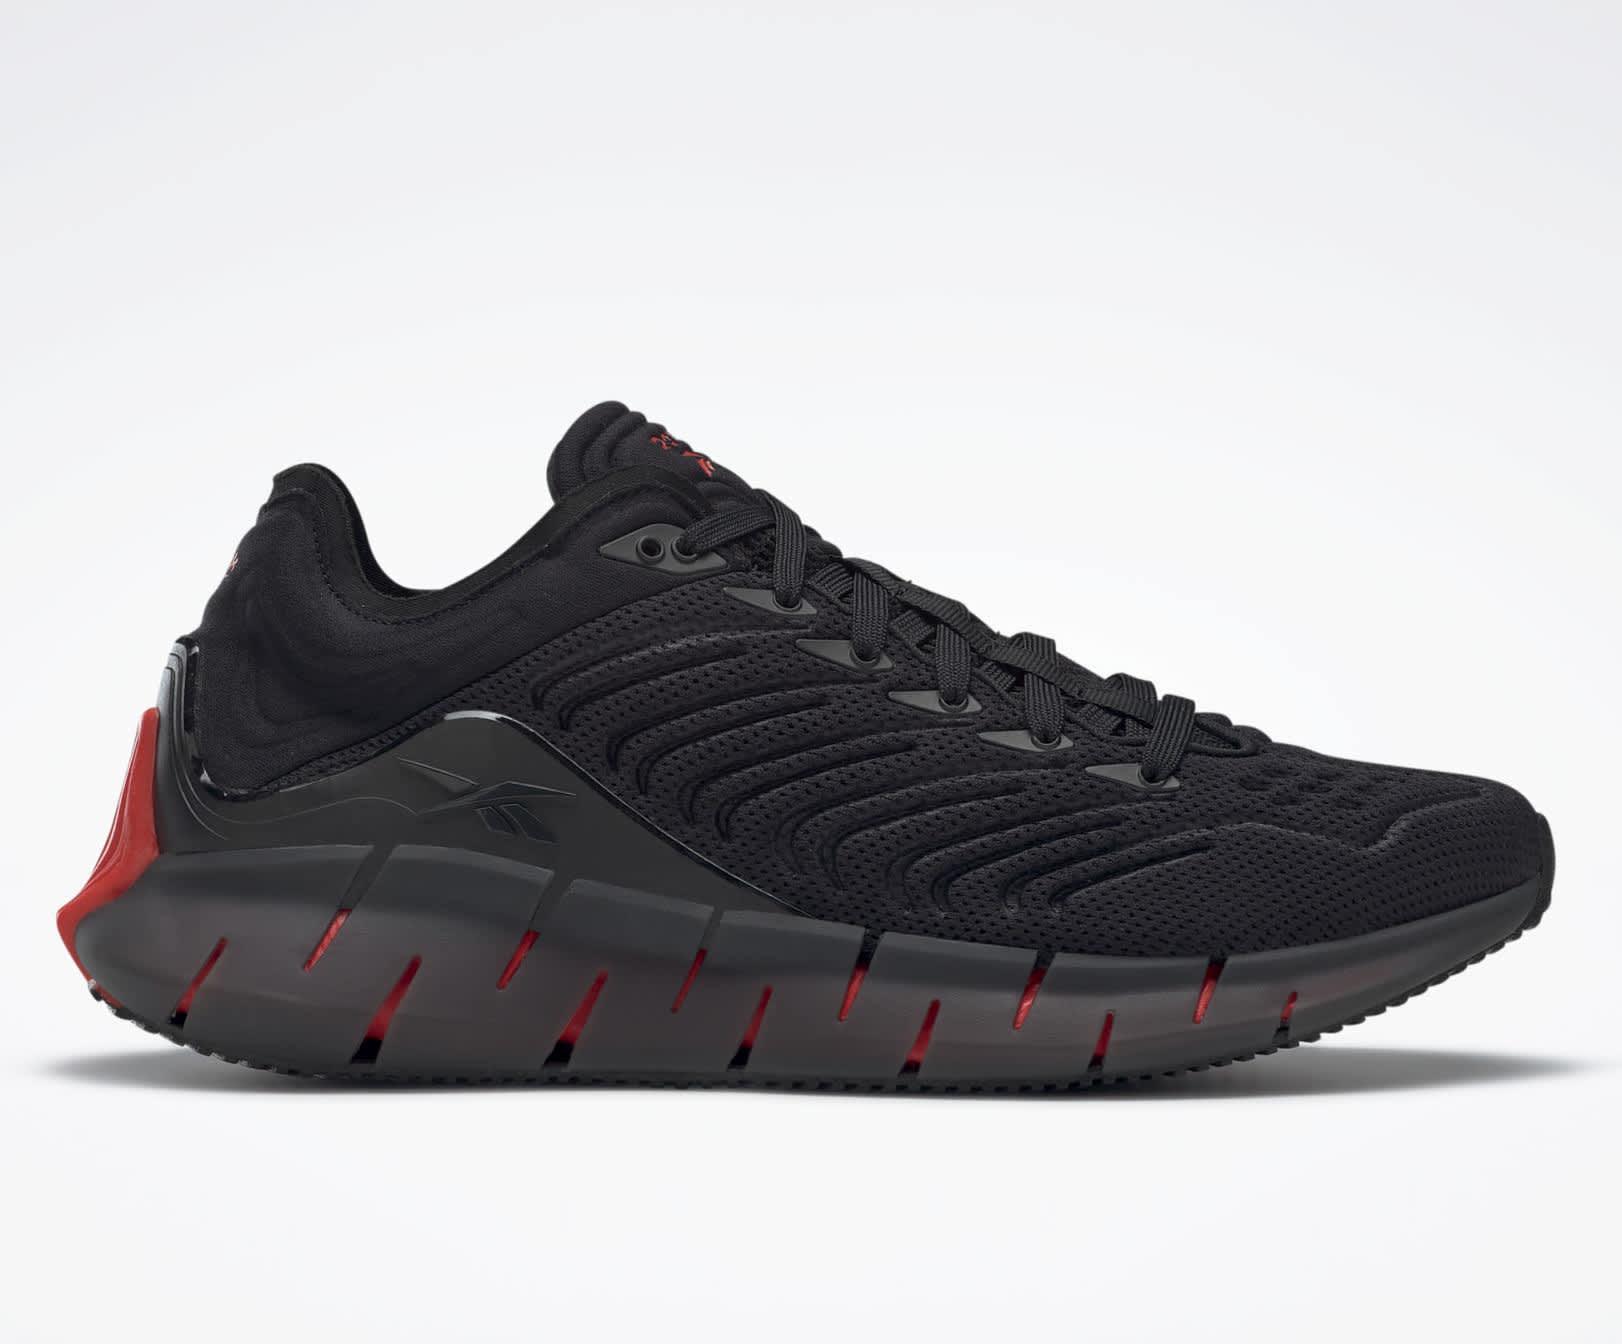 Reebok Men's Zig Kinetica Athletic Shoes